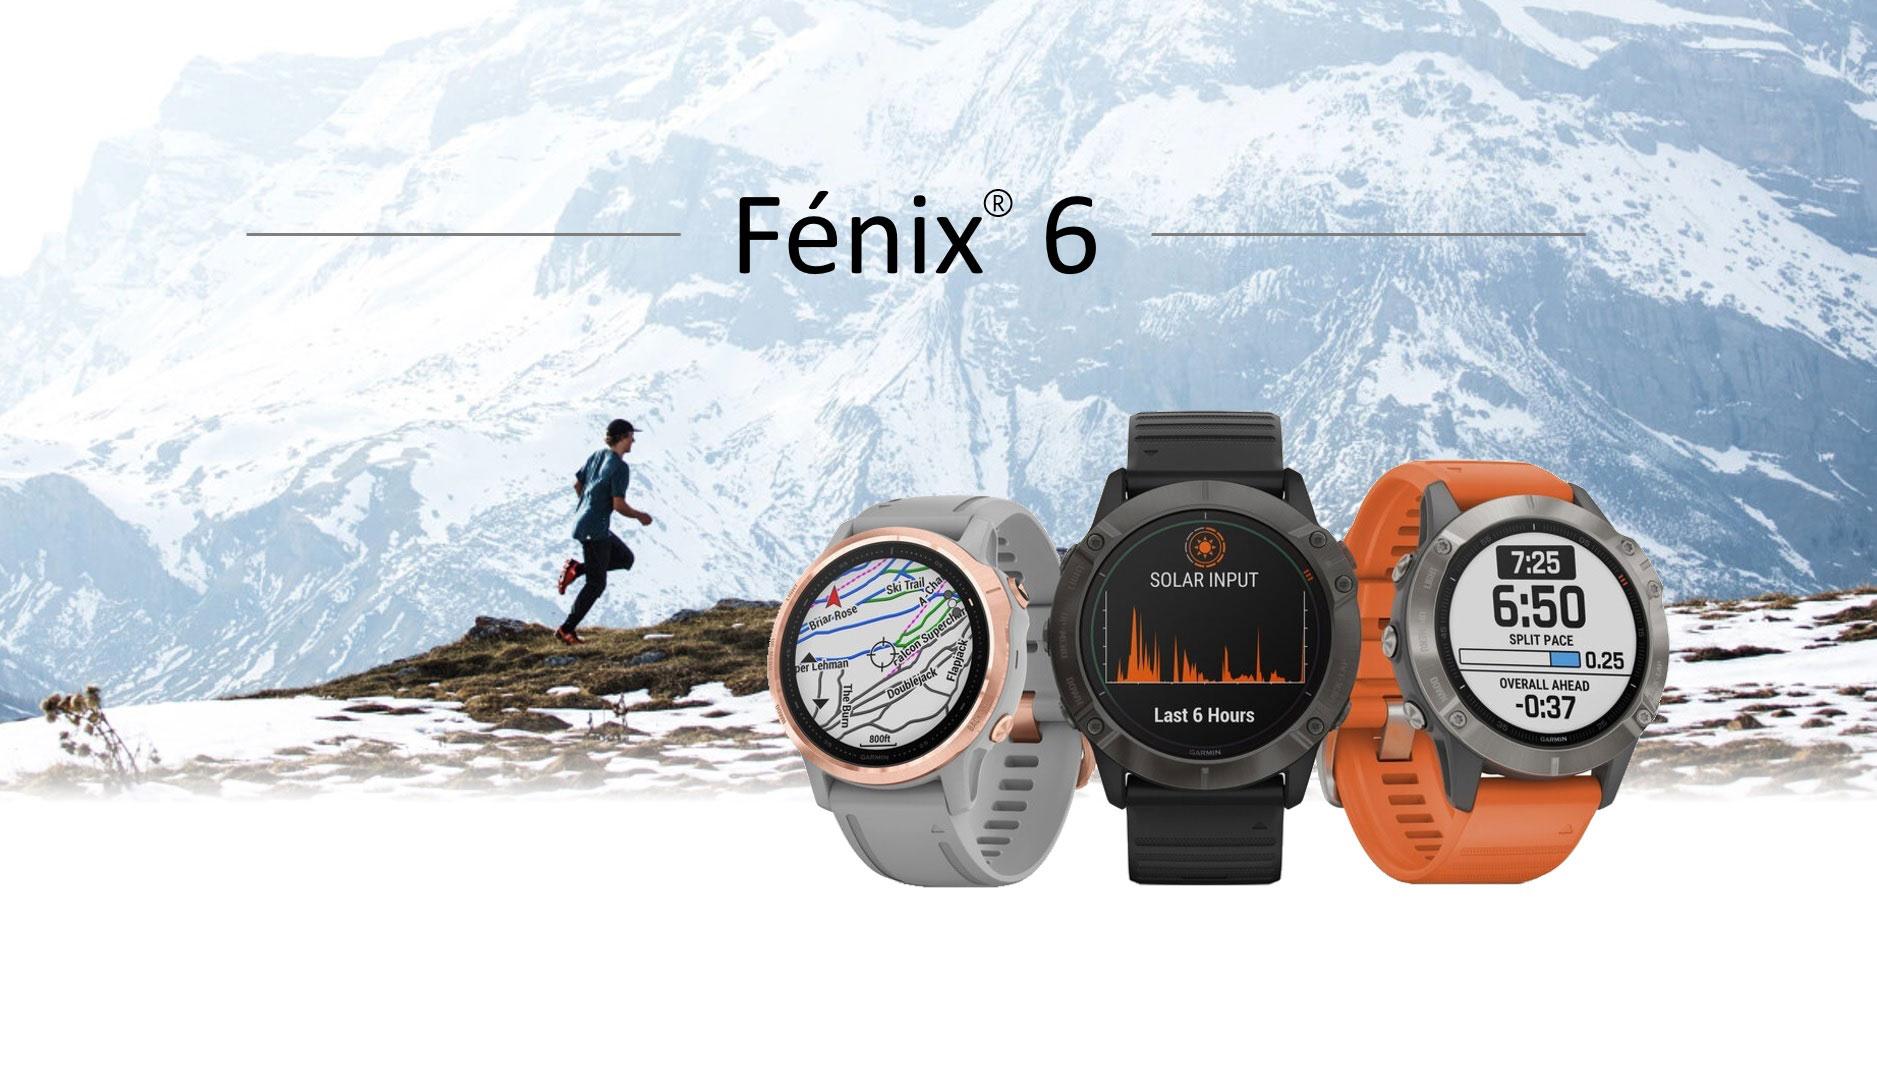 Fenix 6